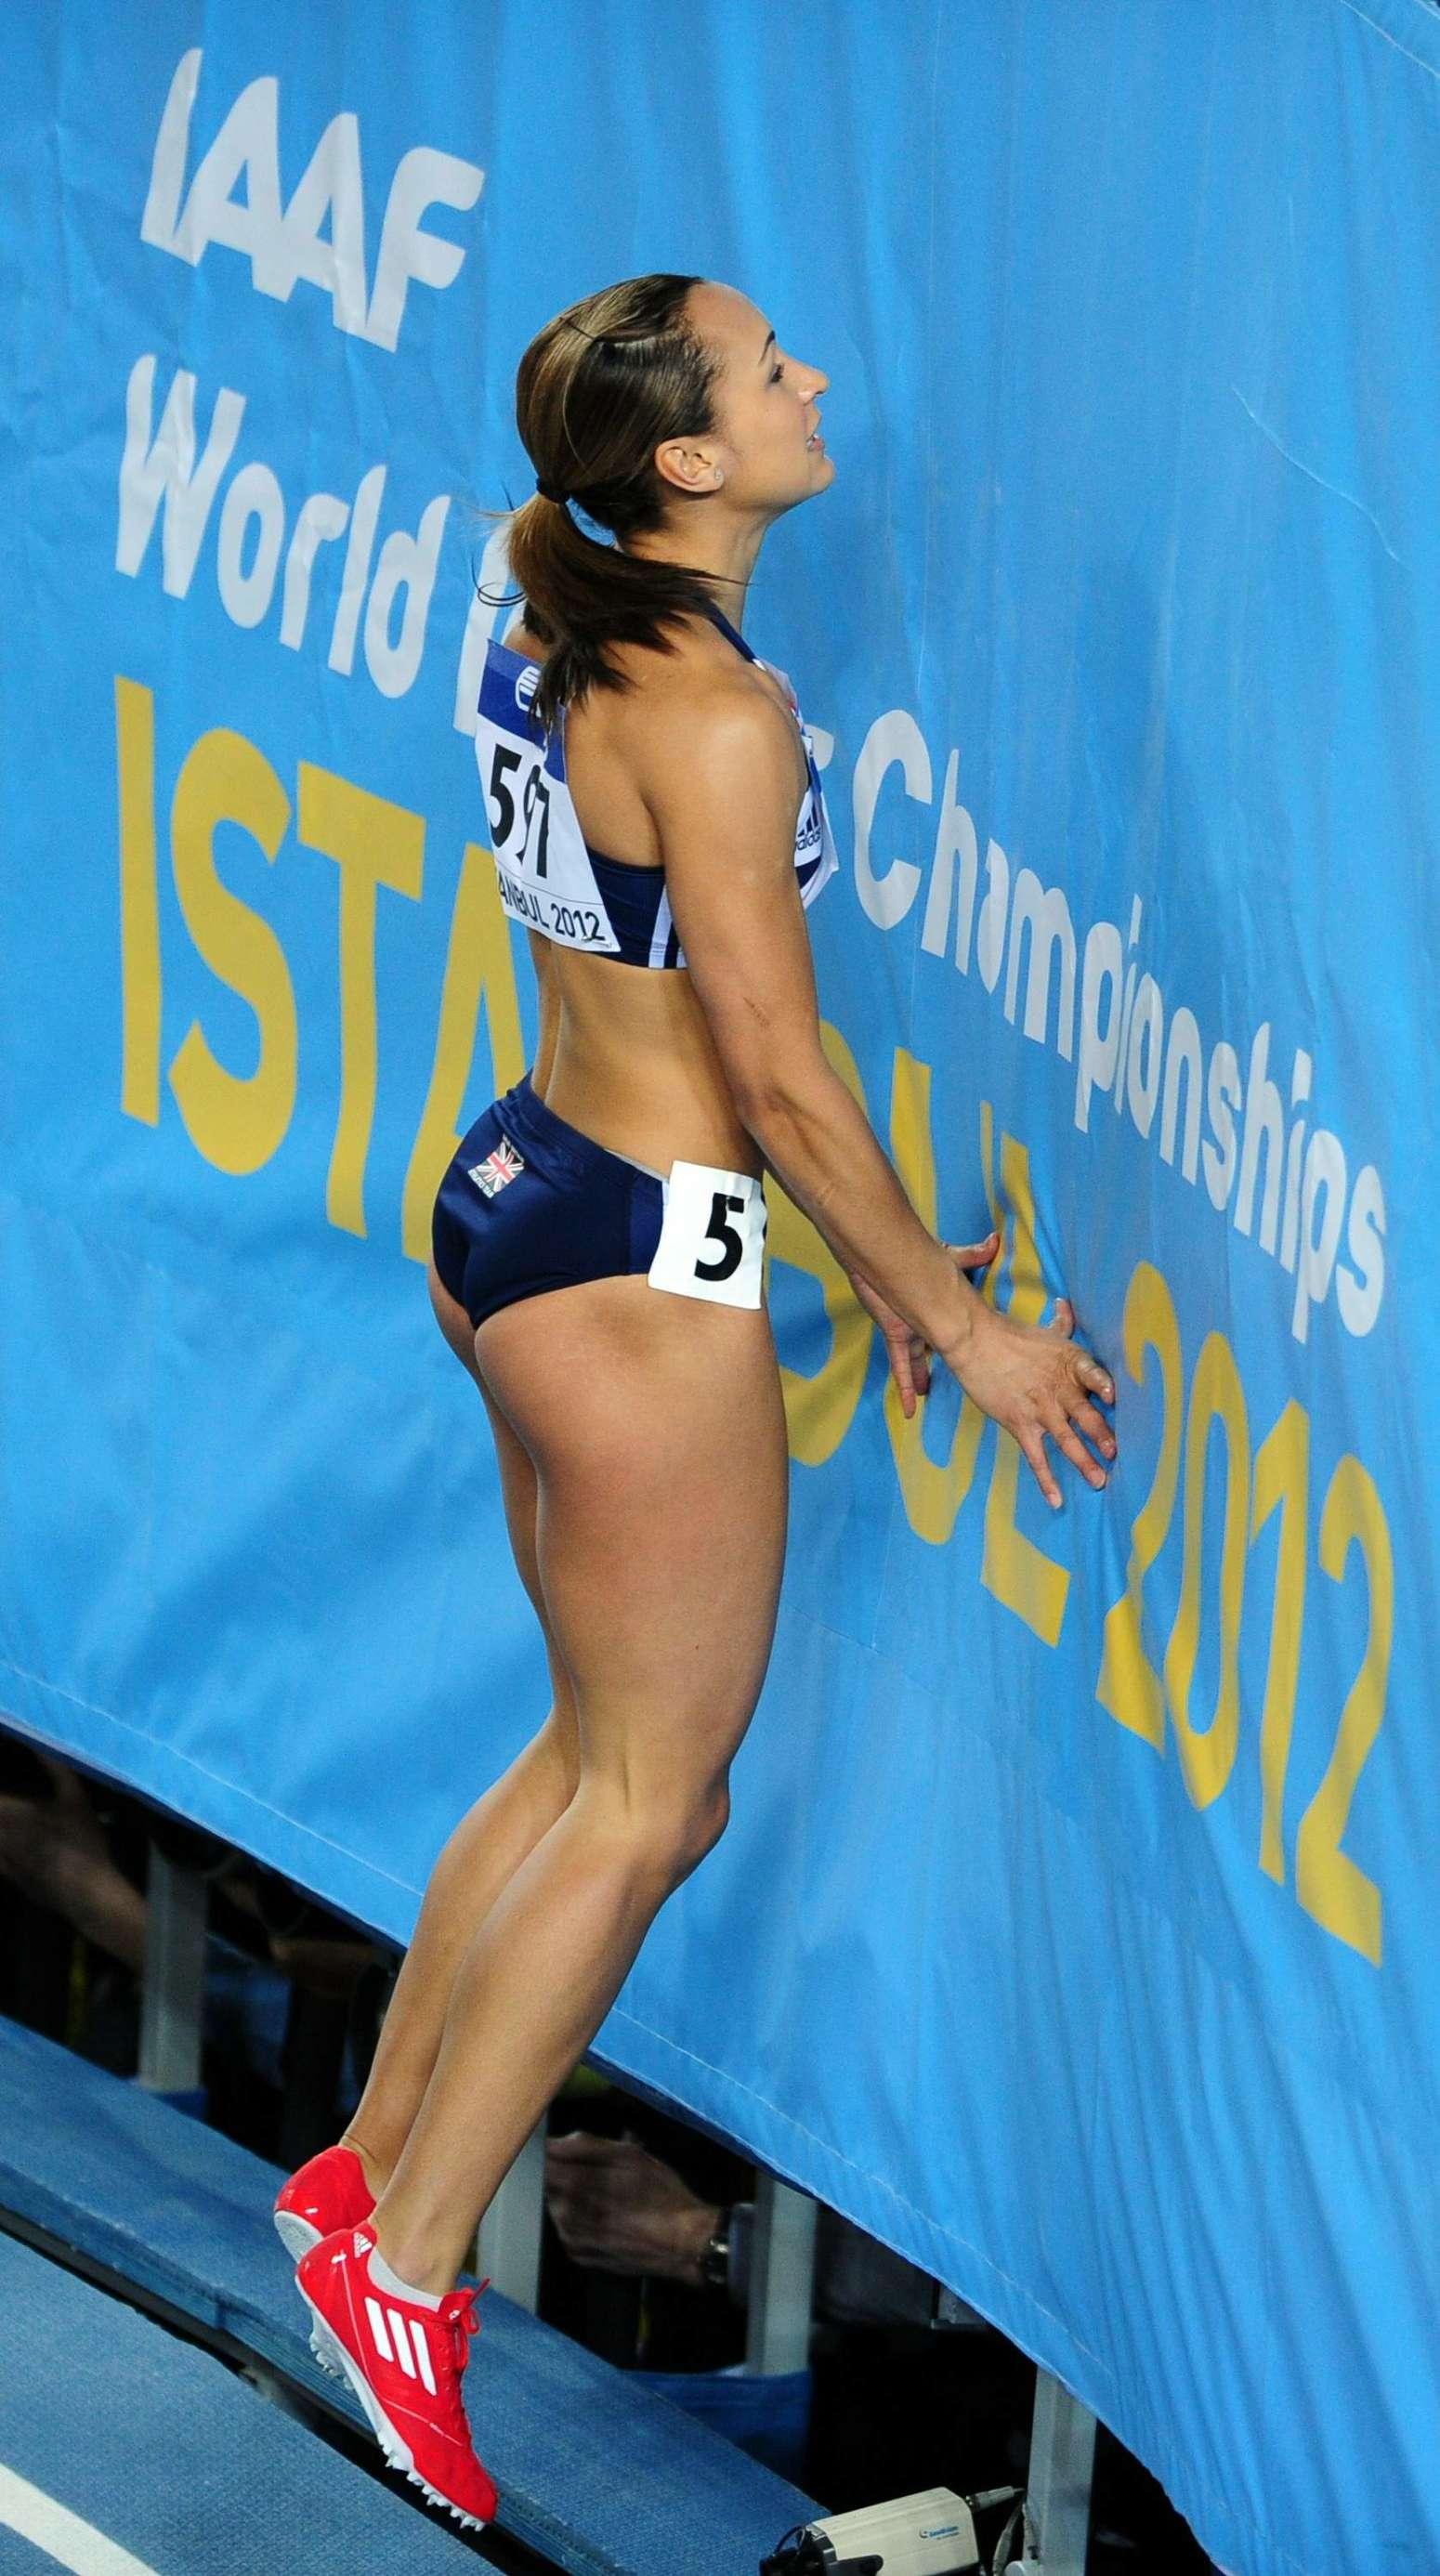 Back to FULL gallery Jessica Ennis IAAF World Indoor Athletics ... Katy Perry